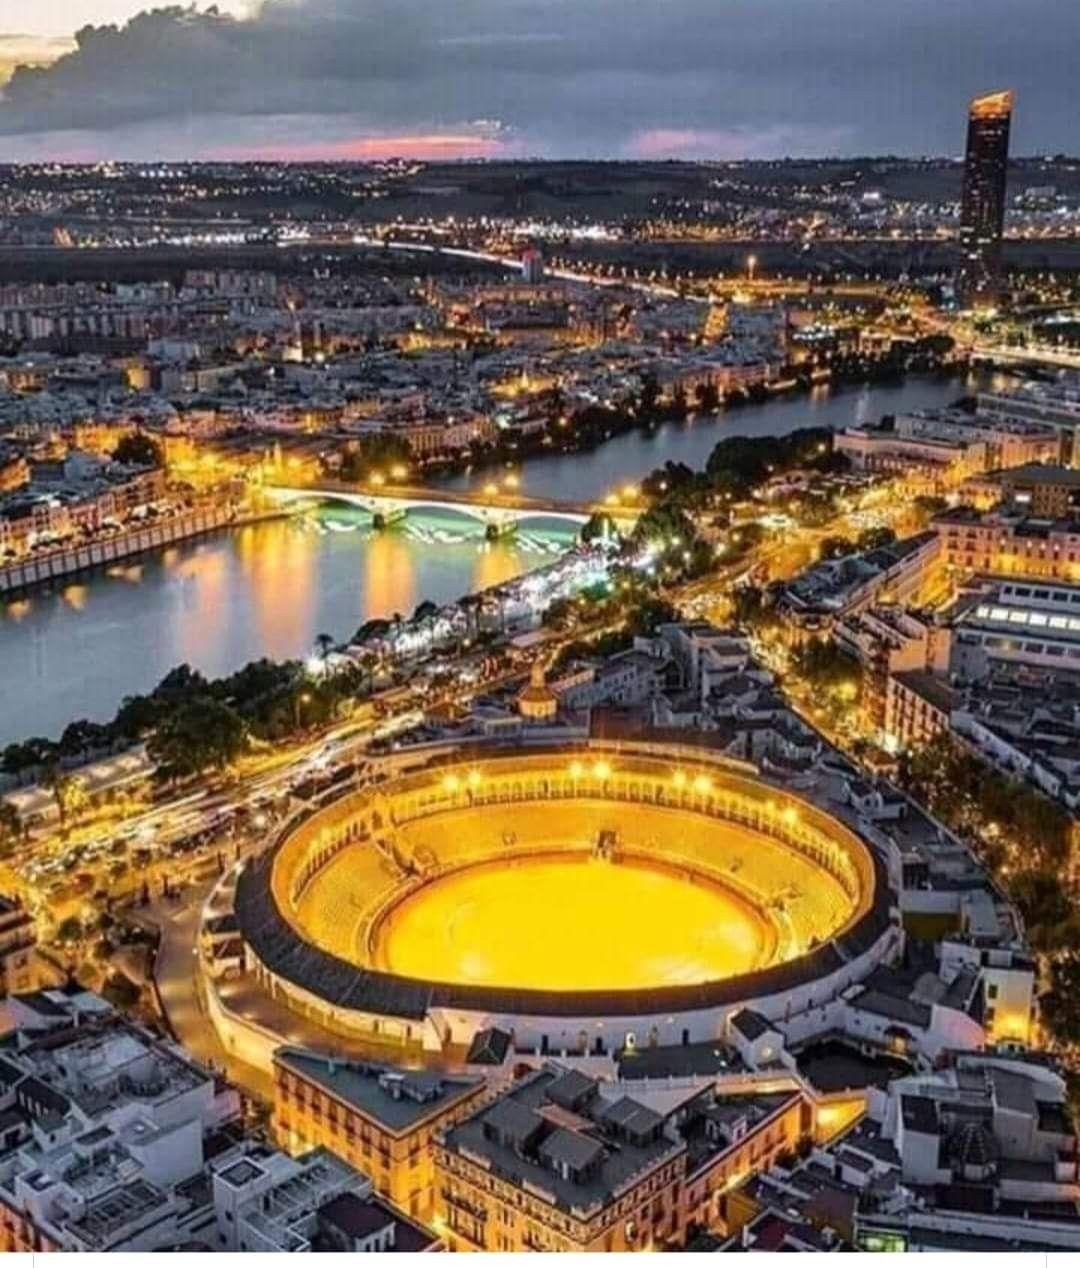 Pin de Andreapistore en Sevilla,rincones en 2020 Sevilla